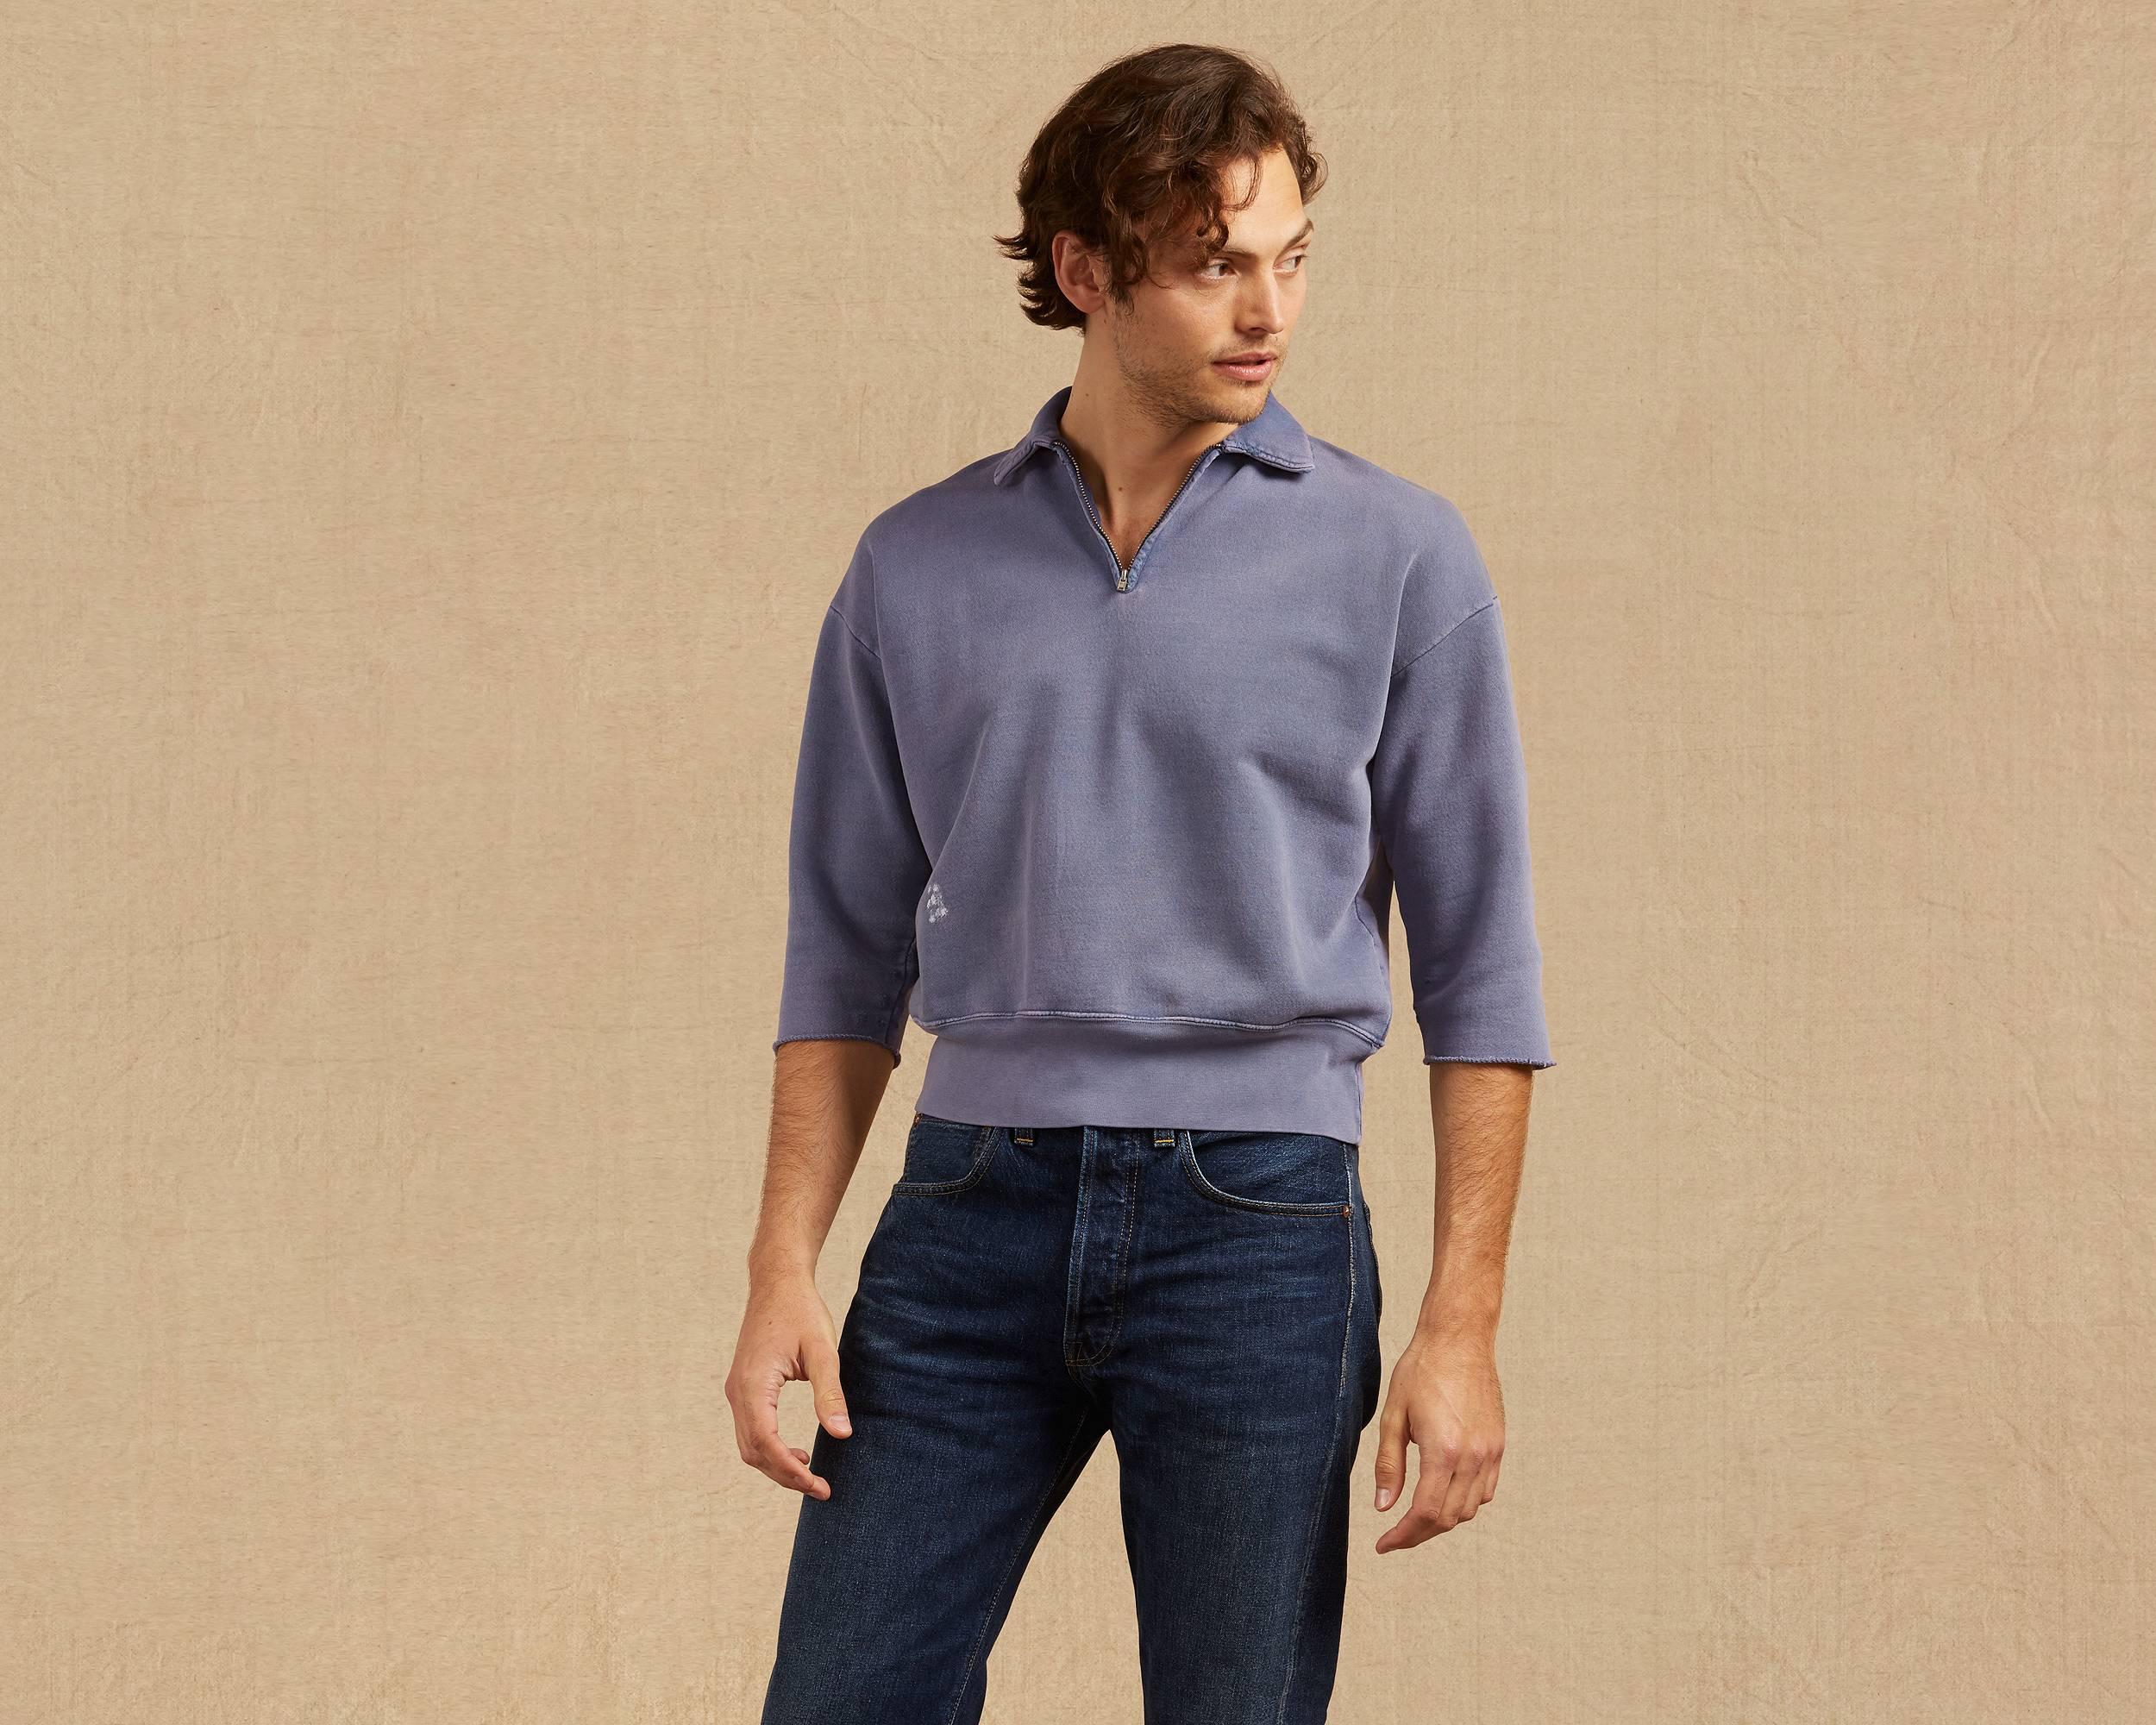 Men's Vintage Style Sweaters – 1920s to 1960s 1950s Zip Sweatshirt $195.00 AT vintagedancer.com